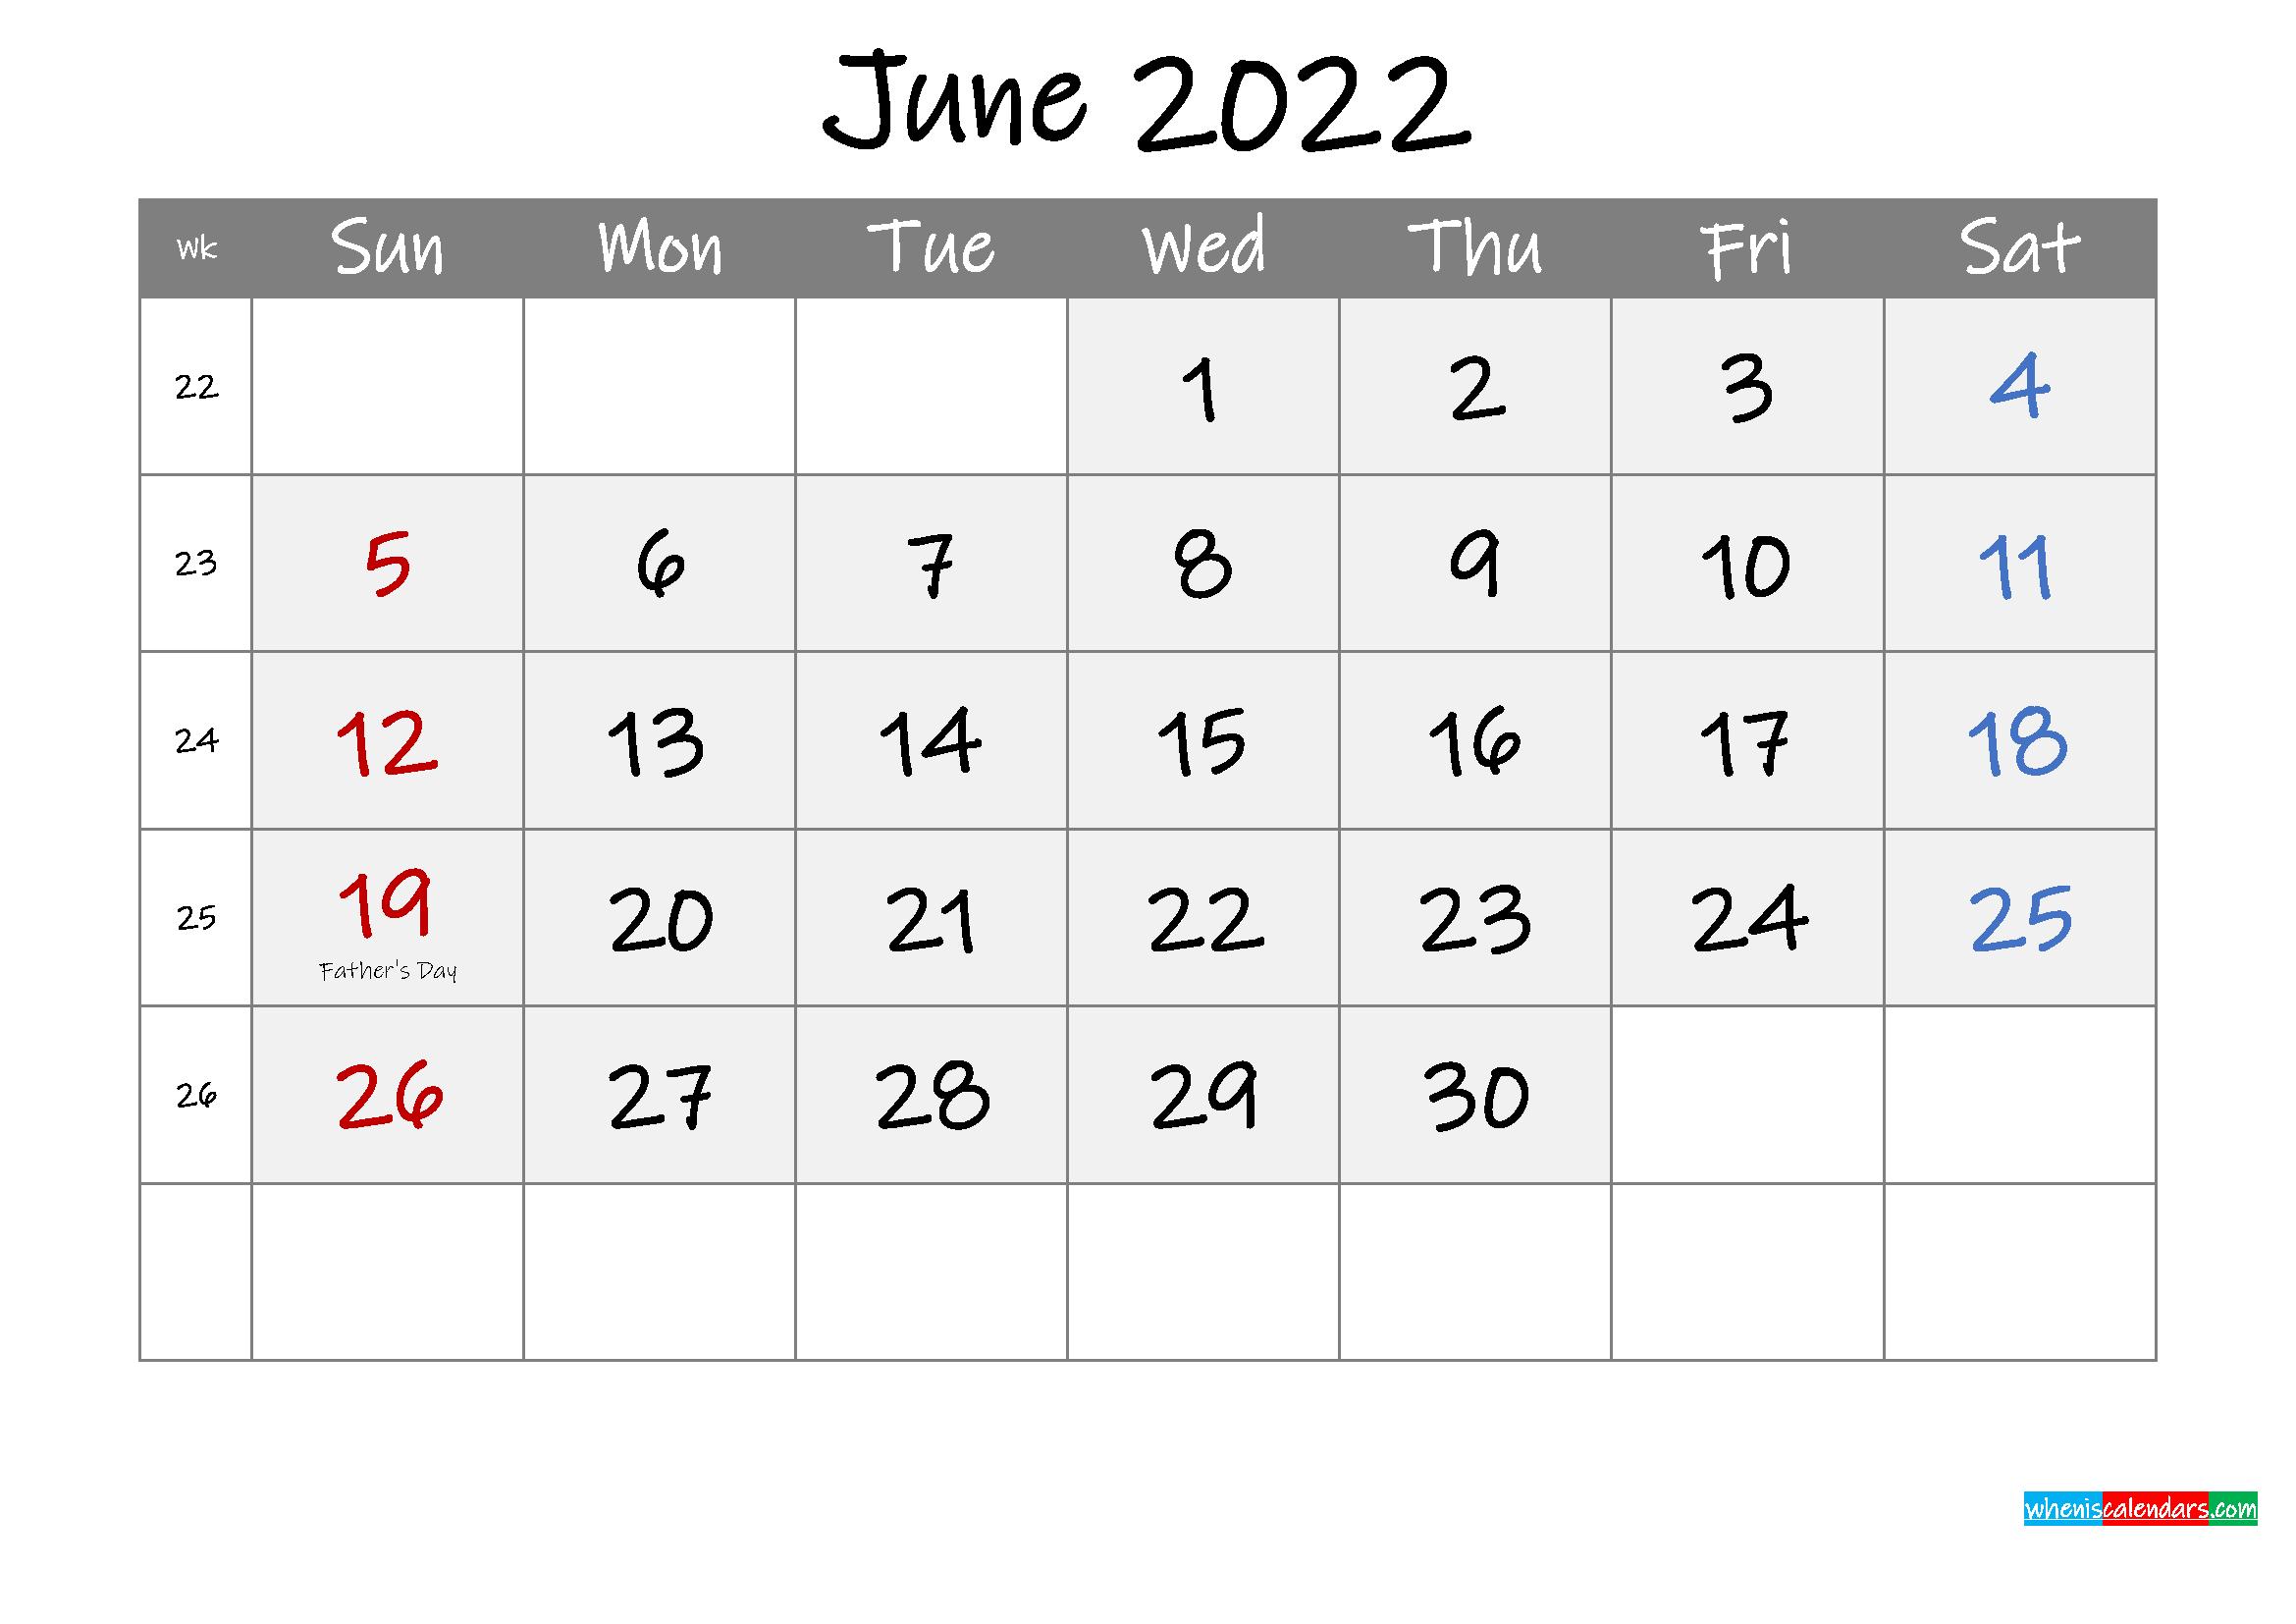 Free Printable June 2022 Calendar with Holidays